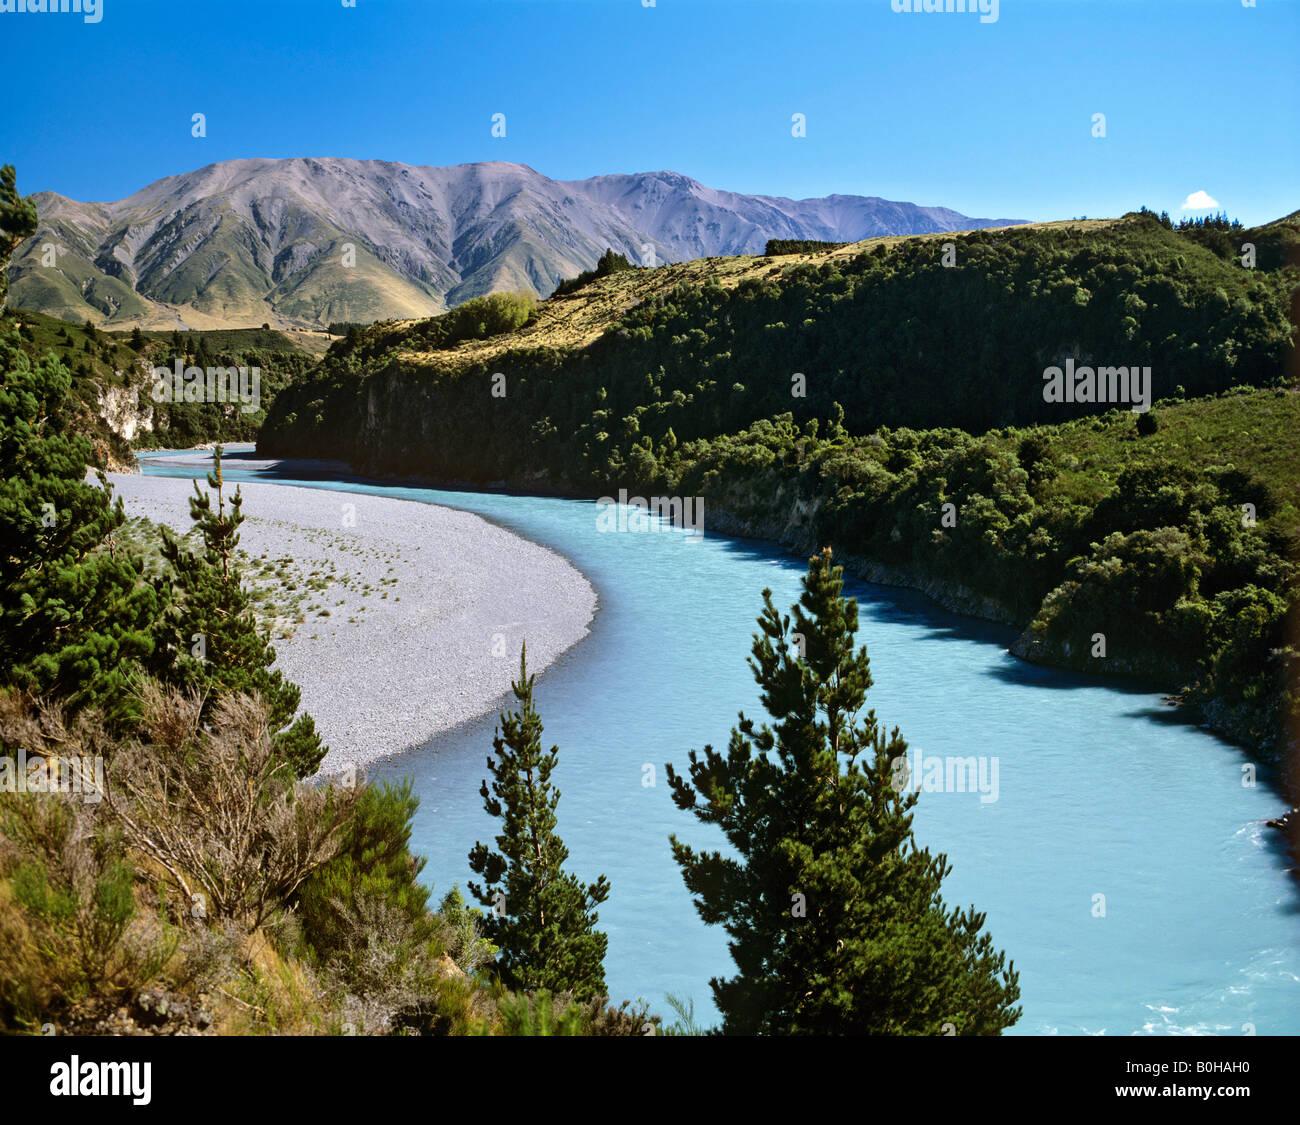 Rakaia Gorge, Rakaia River, Canterbury Plains, South Island, New Zealand - Stock Image